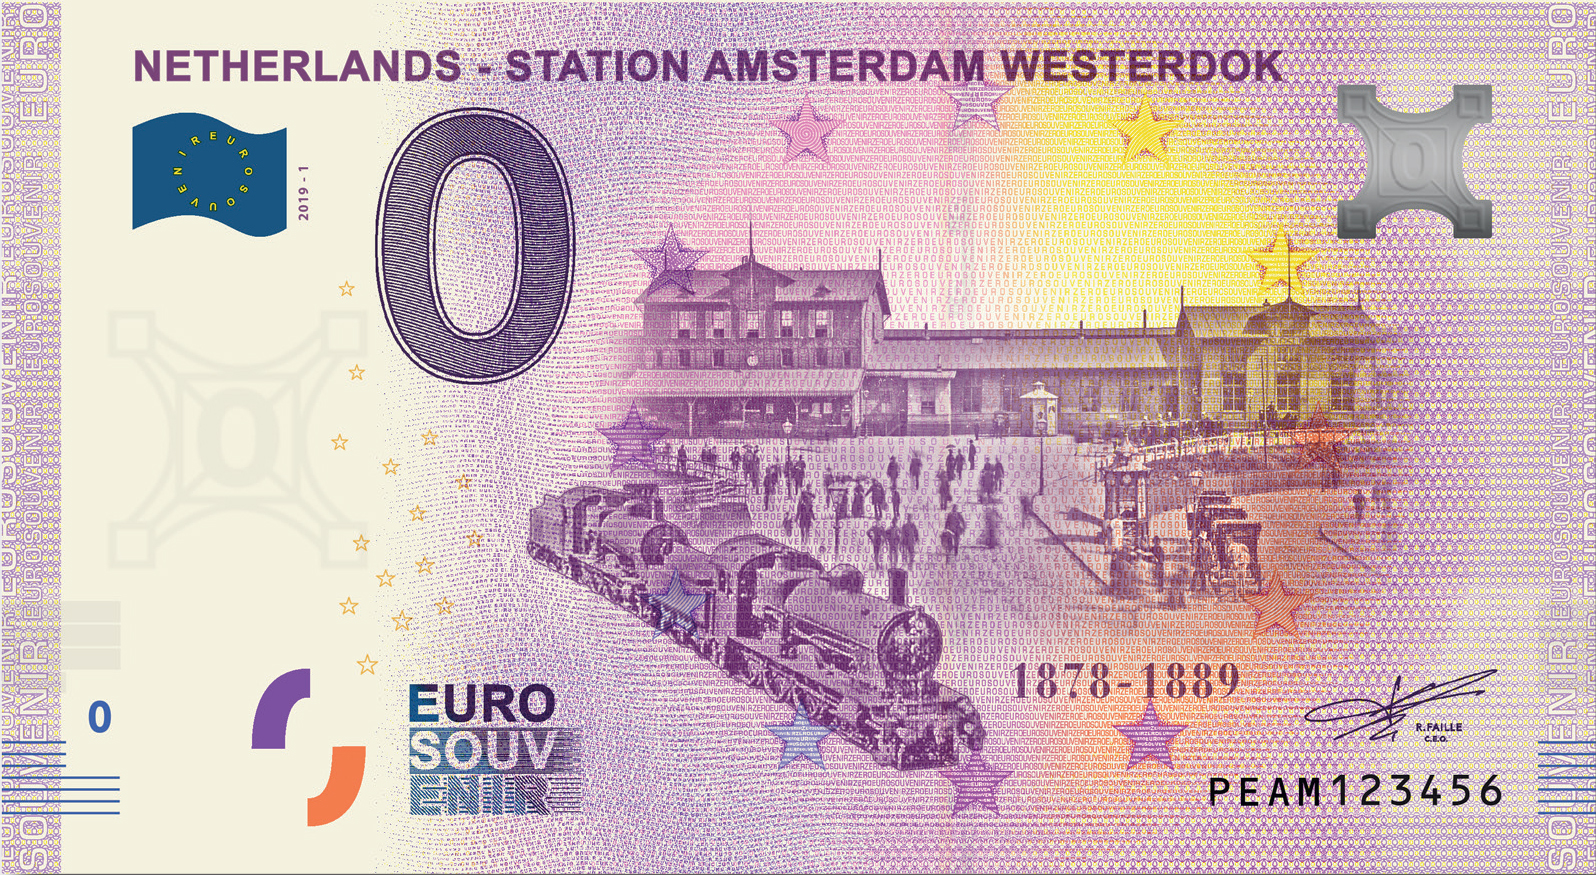 0 Euro NL Station Amsterdam Westerdok.jpg